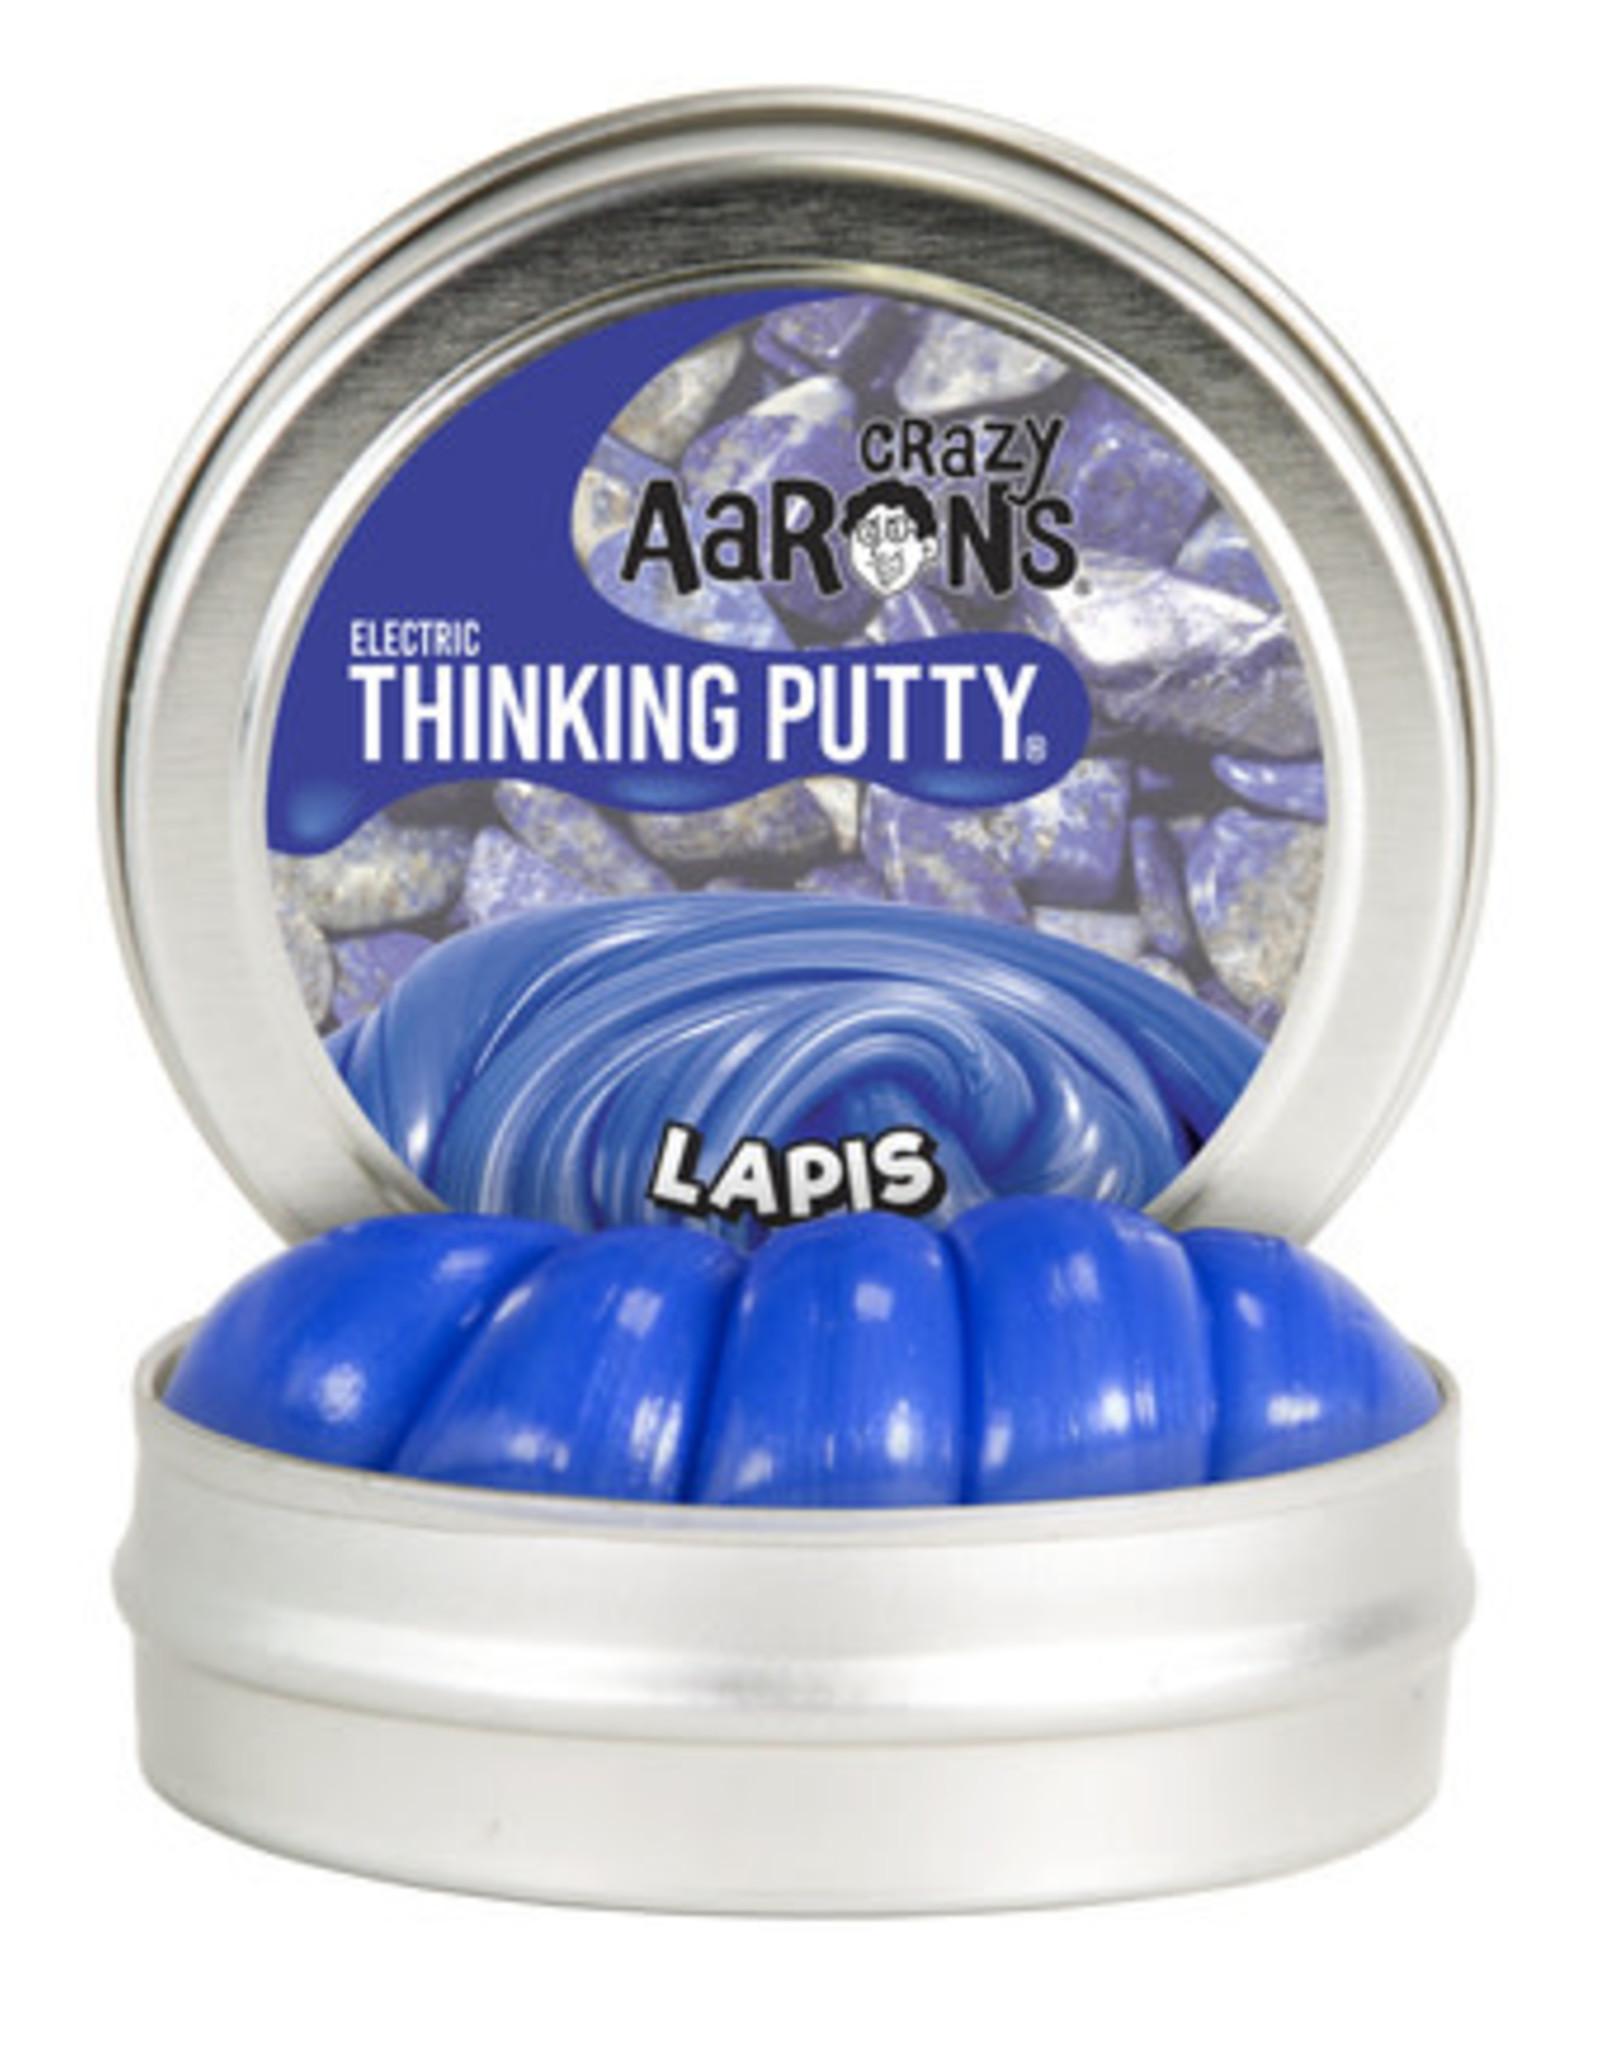 Crazy Aaron's Thinking Putty Crazy Aaron's Mini Tin -  Lapis (Electric)